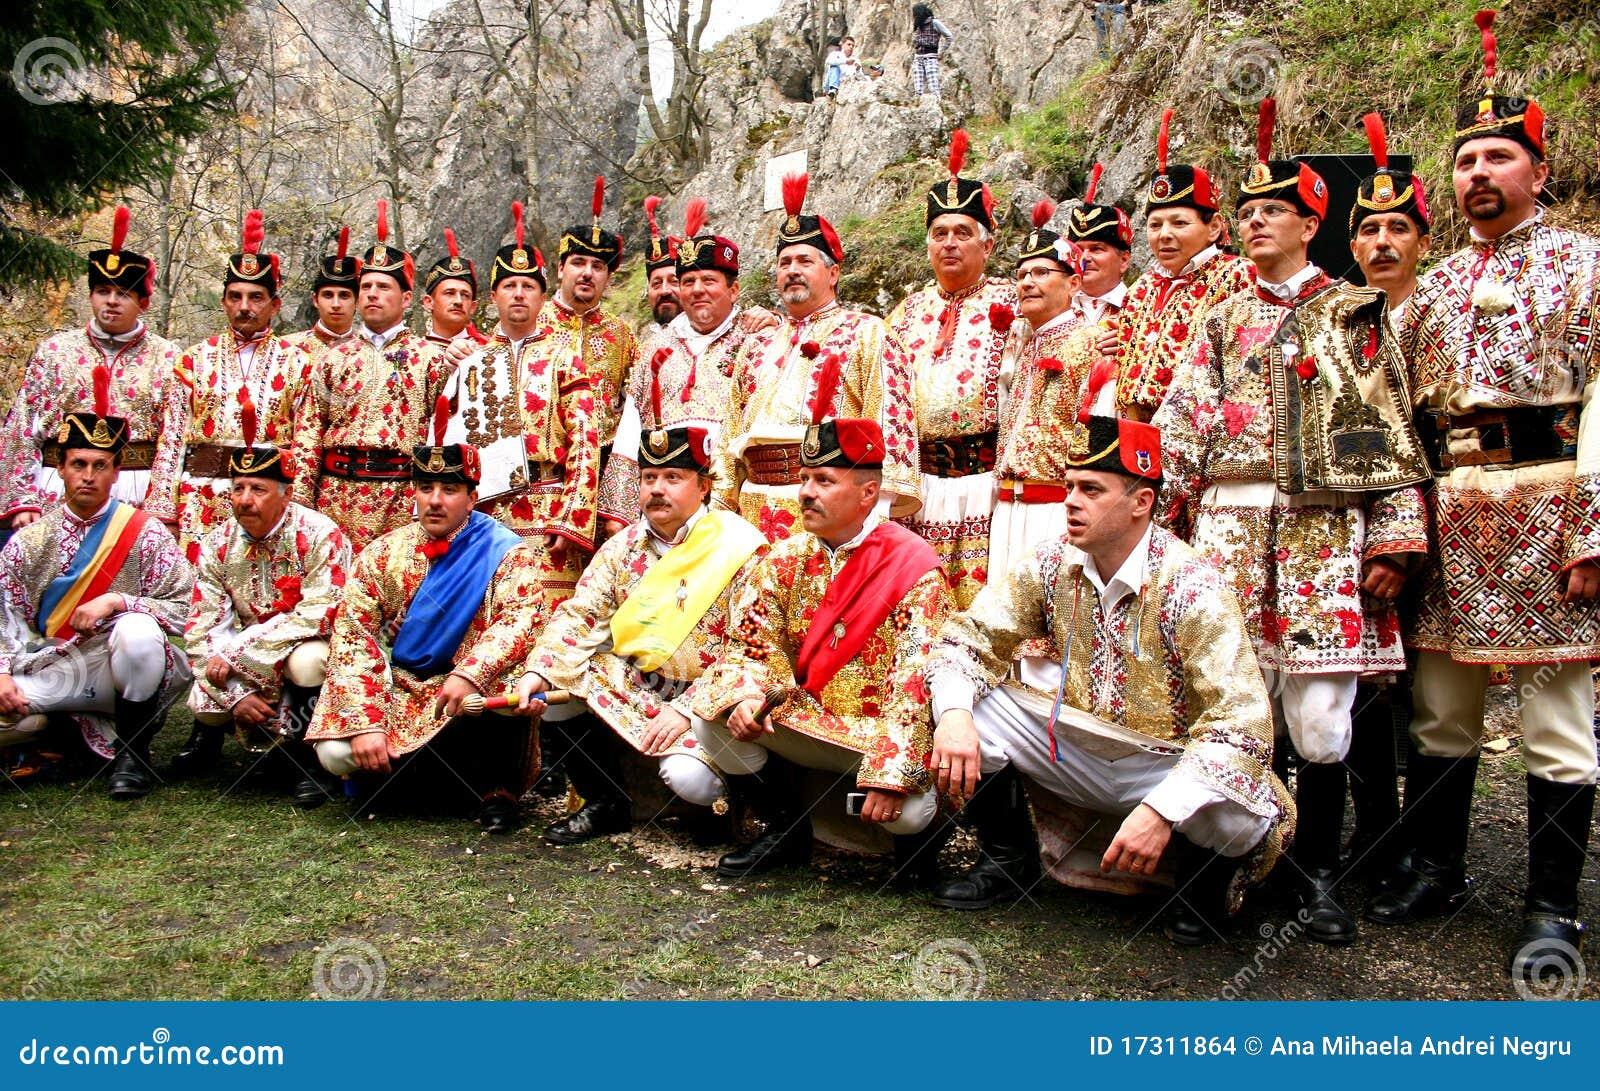 The Red Junii posing before dancing hora